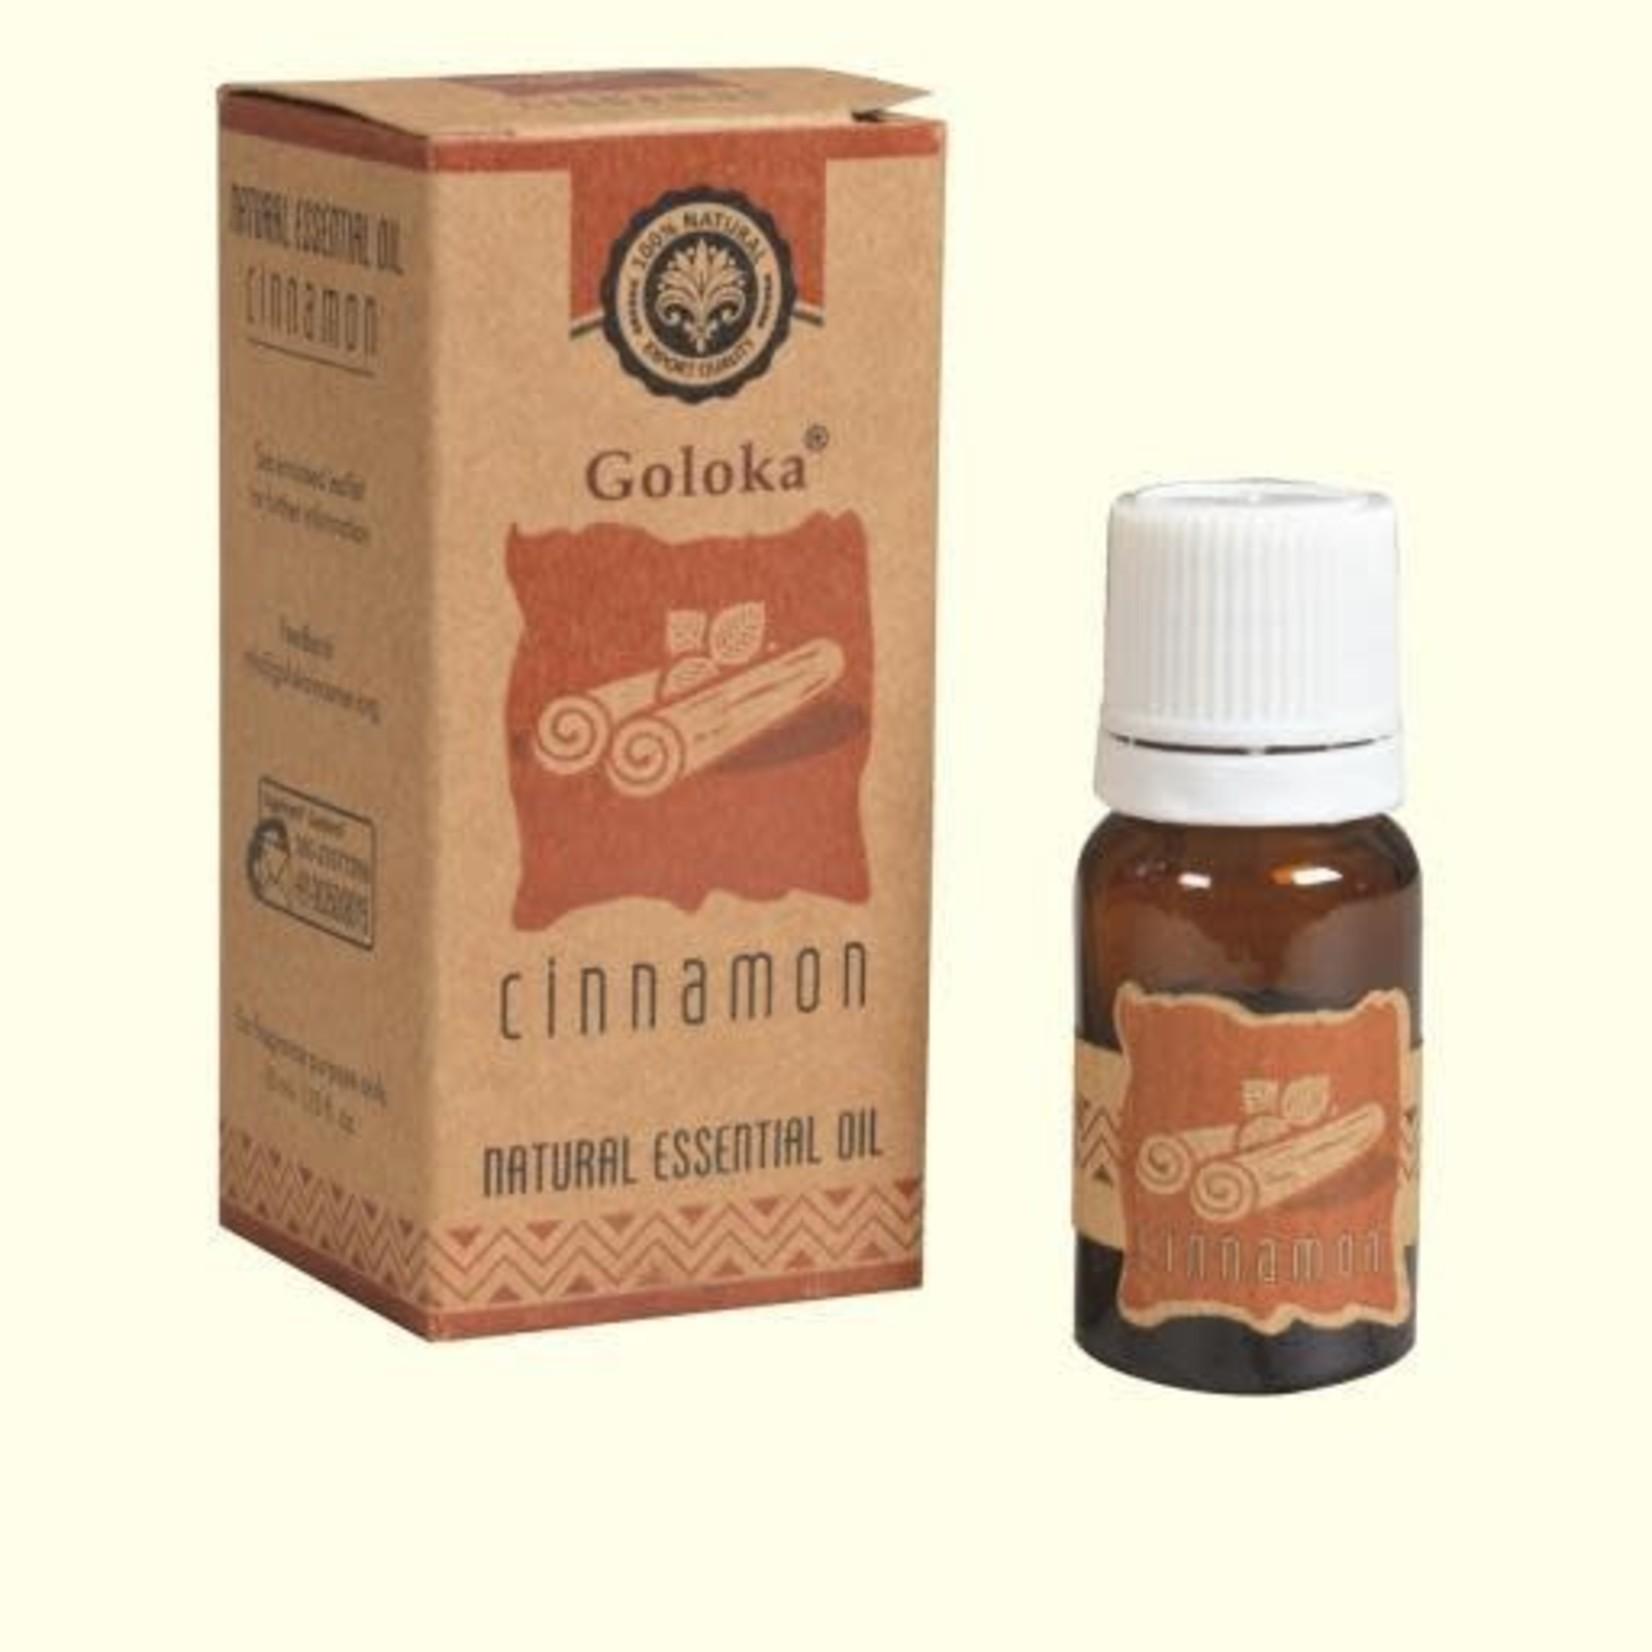 Cinnamon Natural & Undiluted Essential Oil